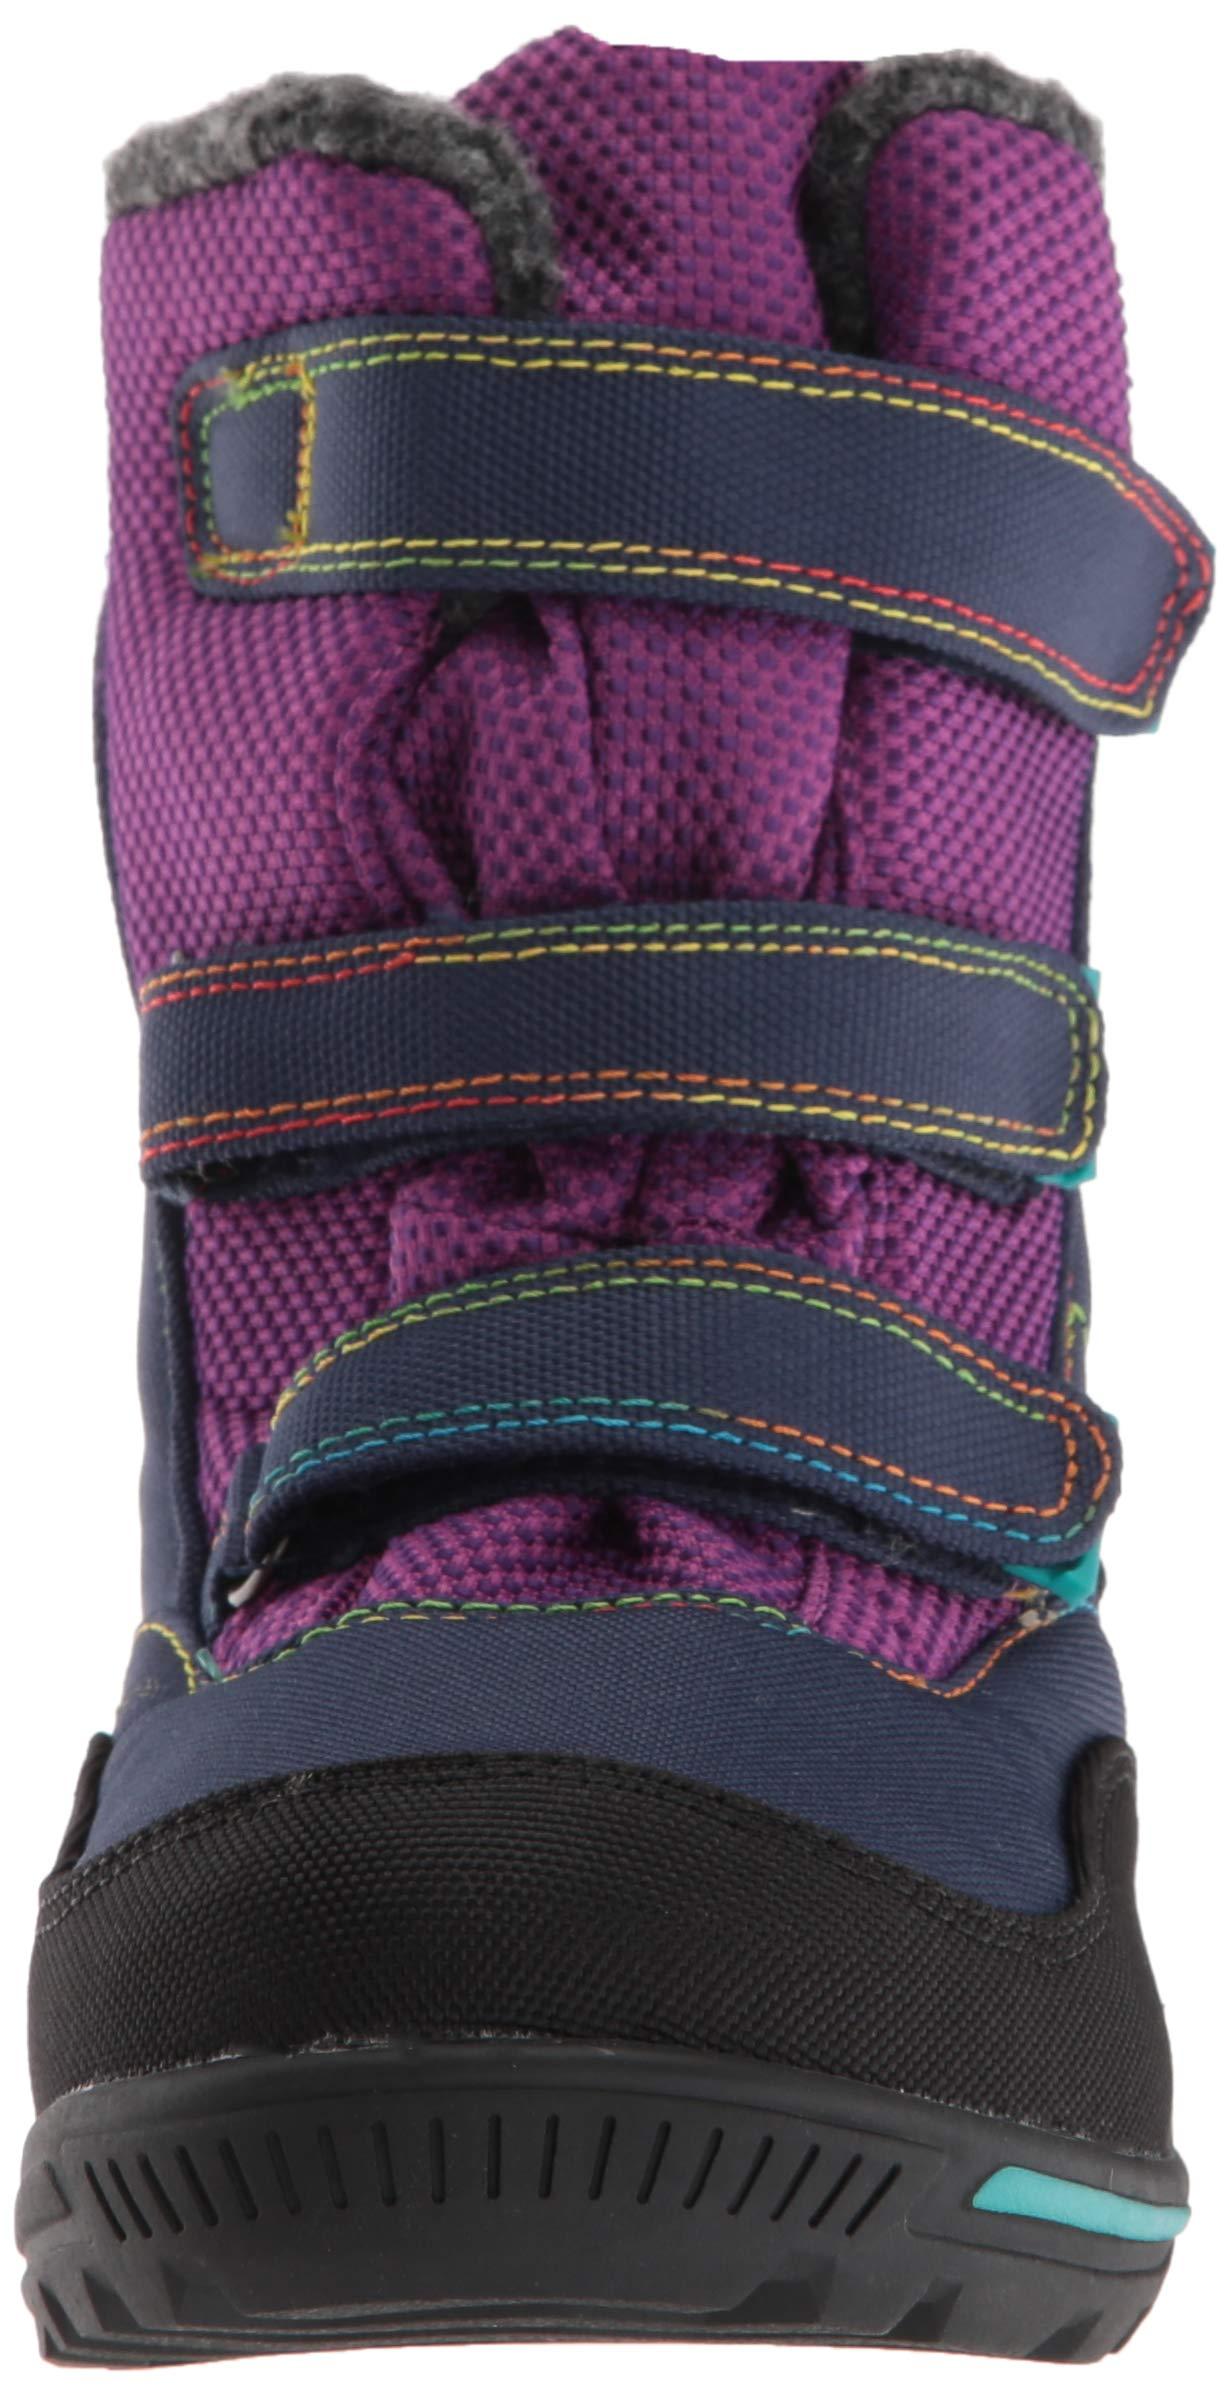 Kamik Girls' Hayden Snow Boot, Grape, 4 Medium US Big Kid by Kamik (Image #4)